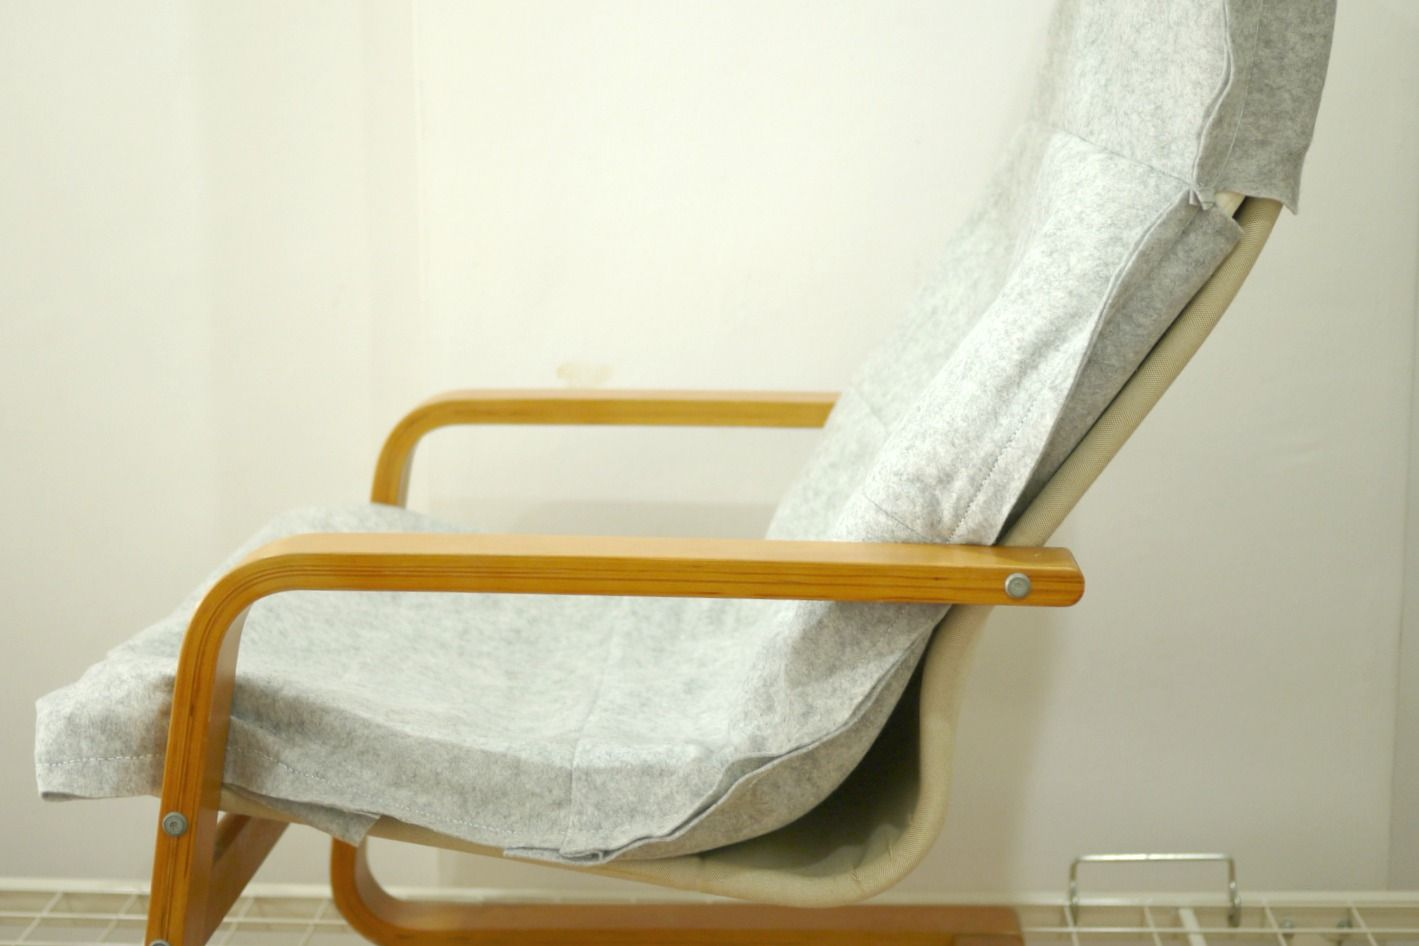 Surprising Make Diy Ikea Pello Poang Chair Felt Cover Chair Ikea Creativecarmelina Interior Chair Design Creativecarmelinacom